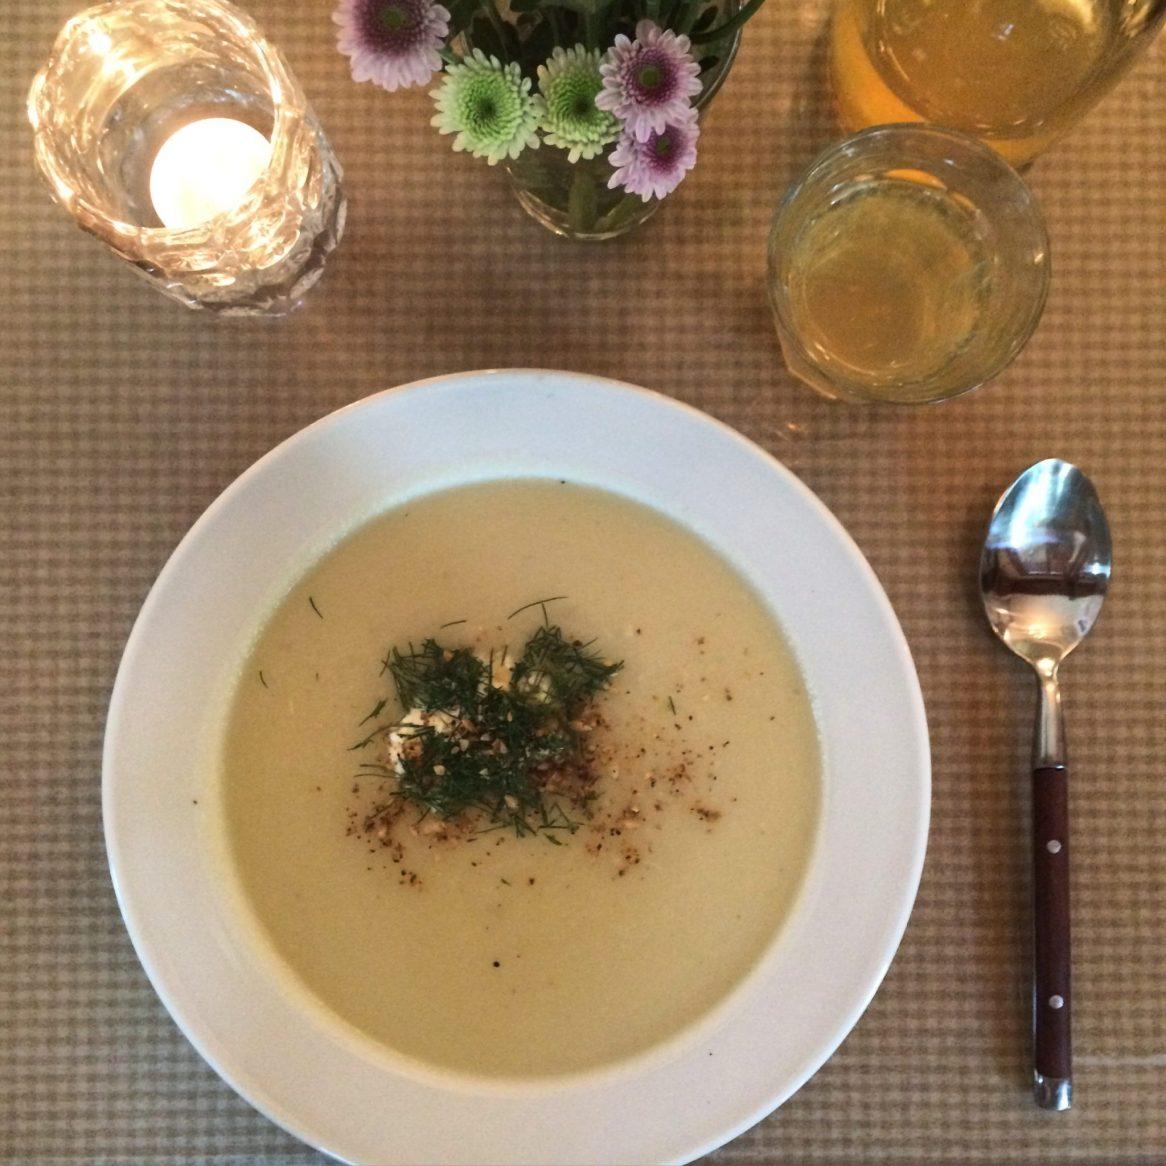 Bowl of kohlrabi soup